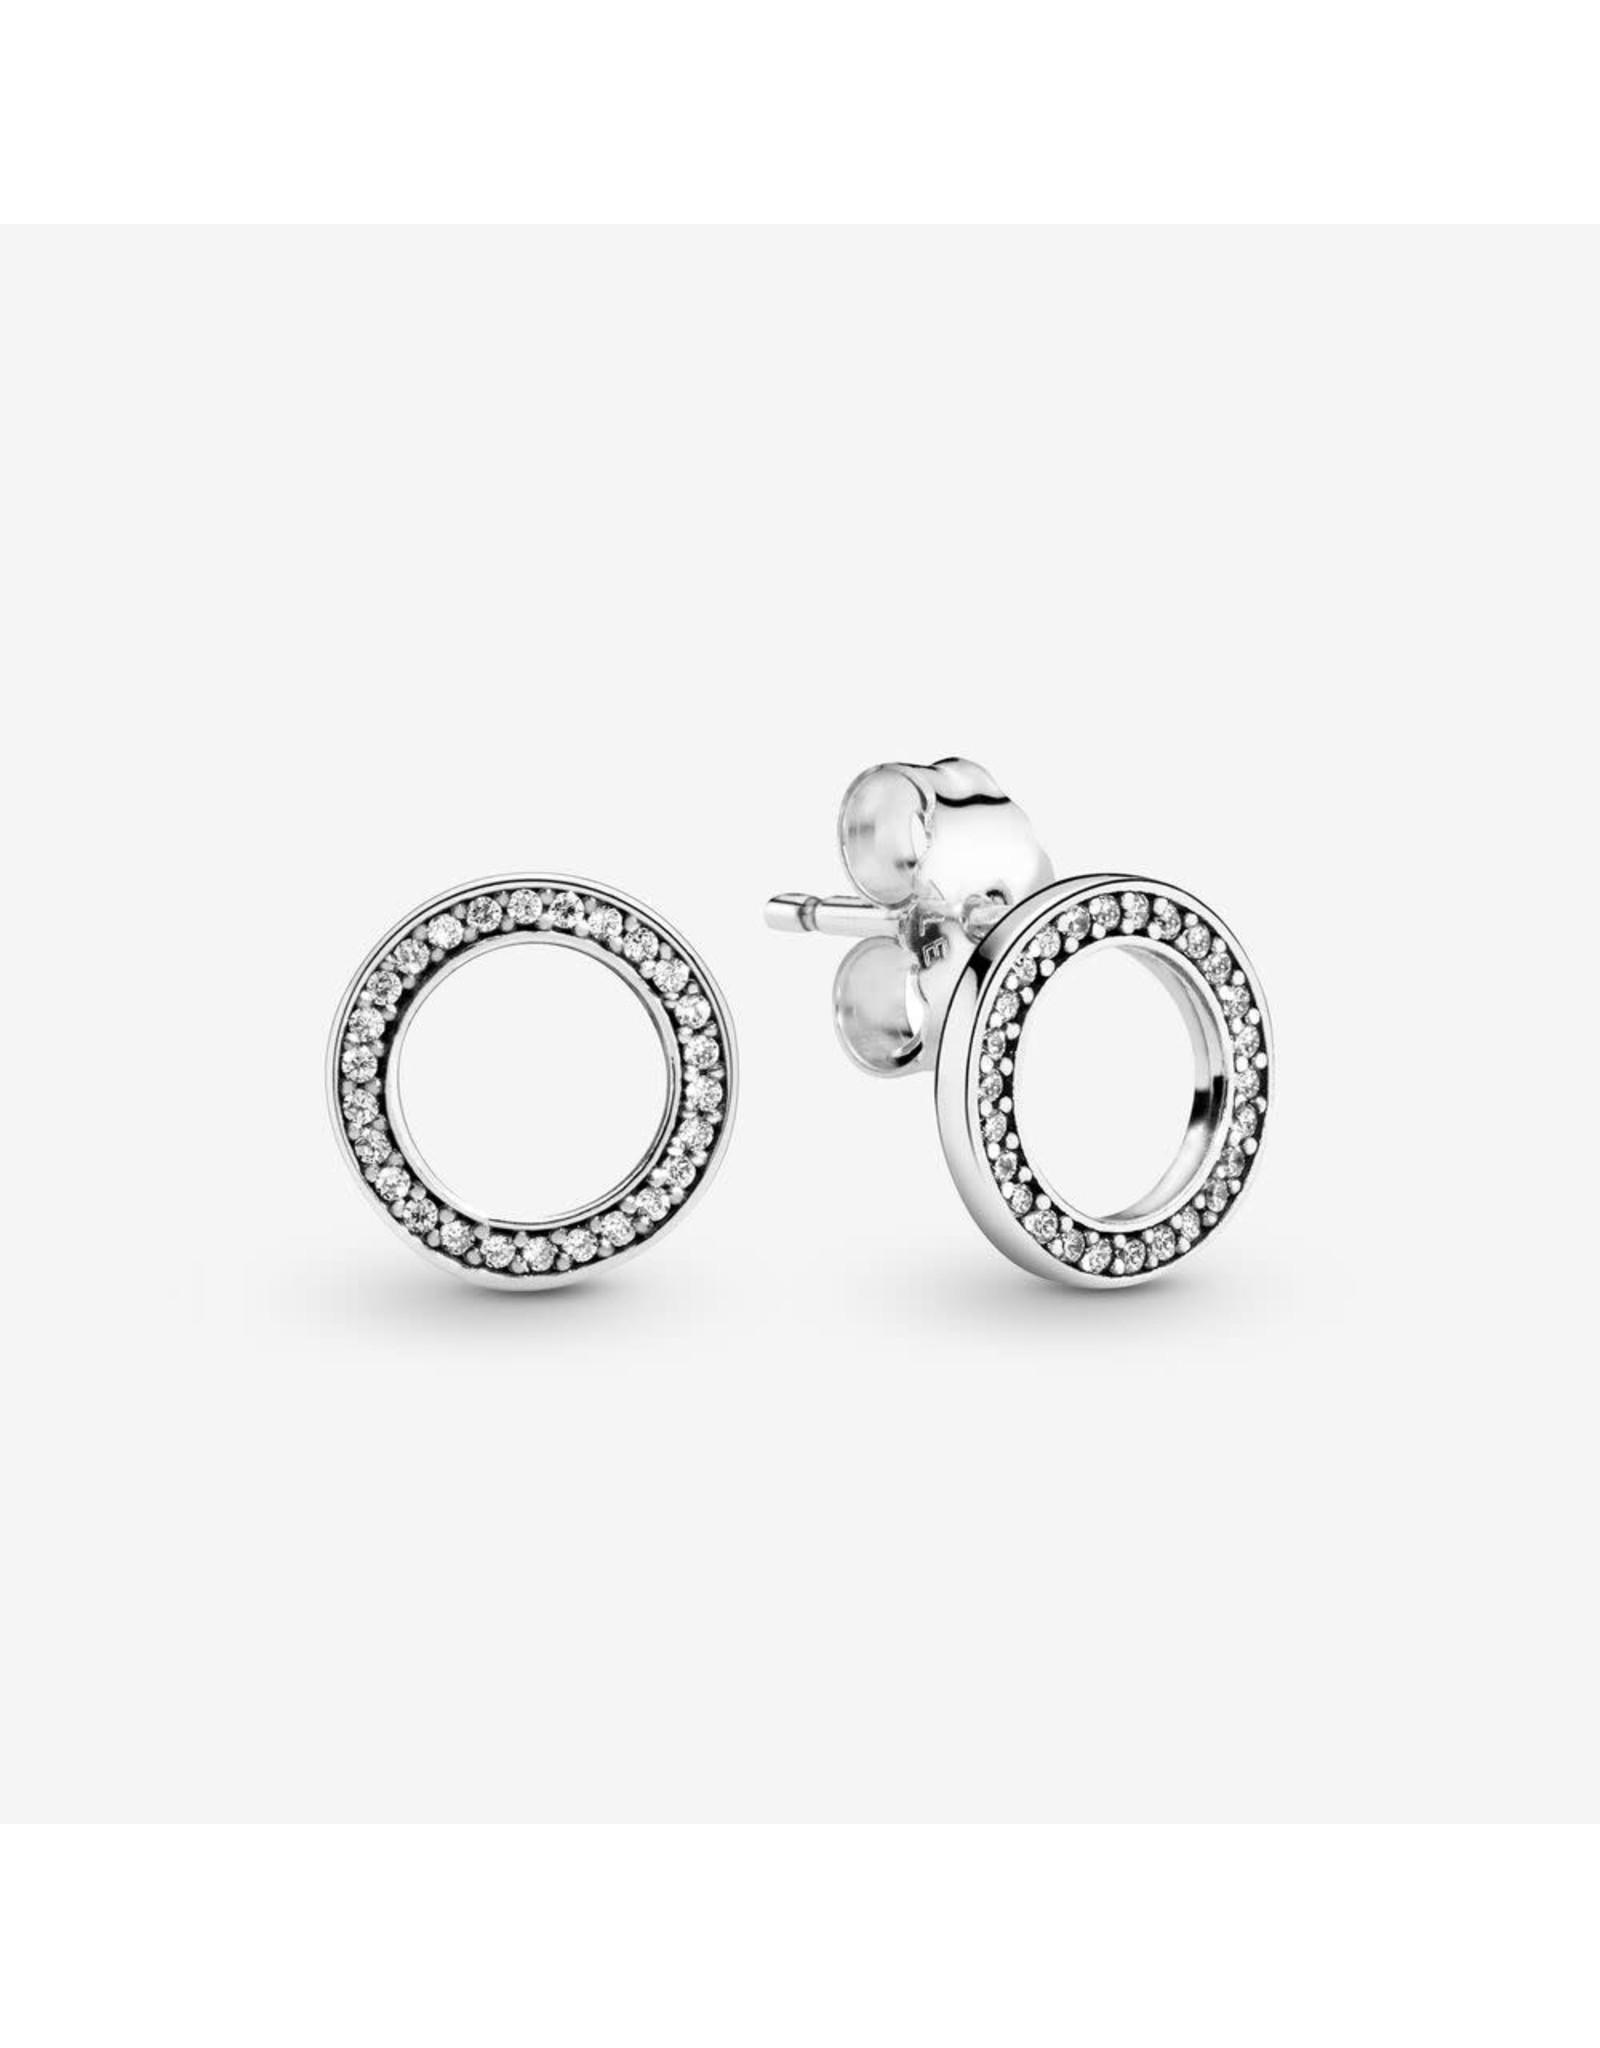 Pandora Pandora Earrings,290585CZ, Forever Stud Clear CZ